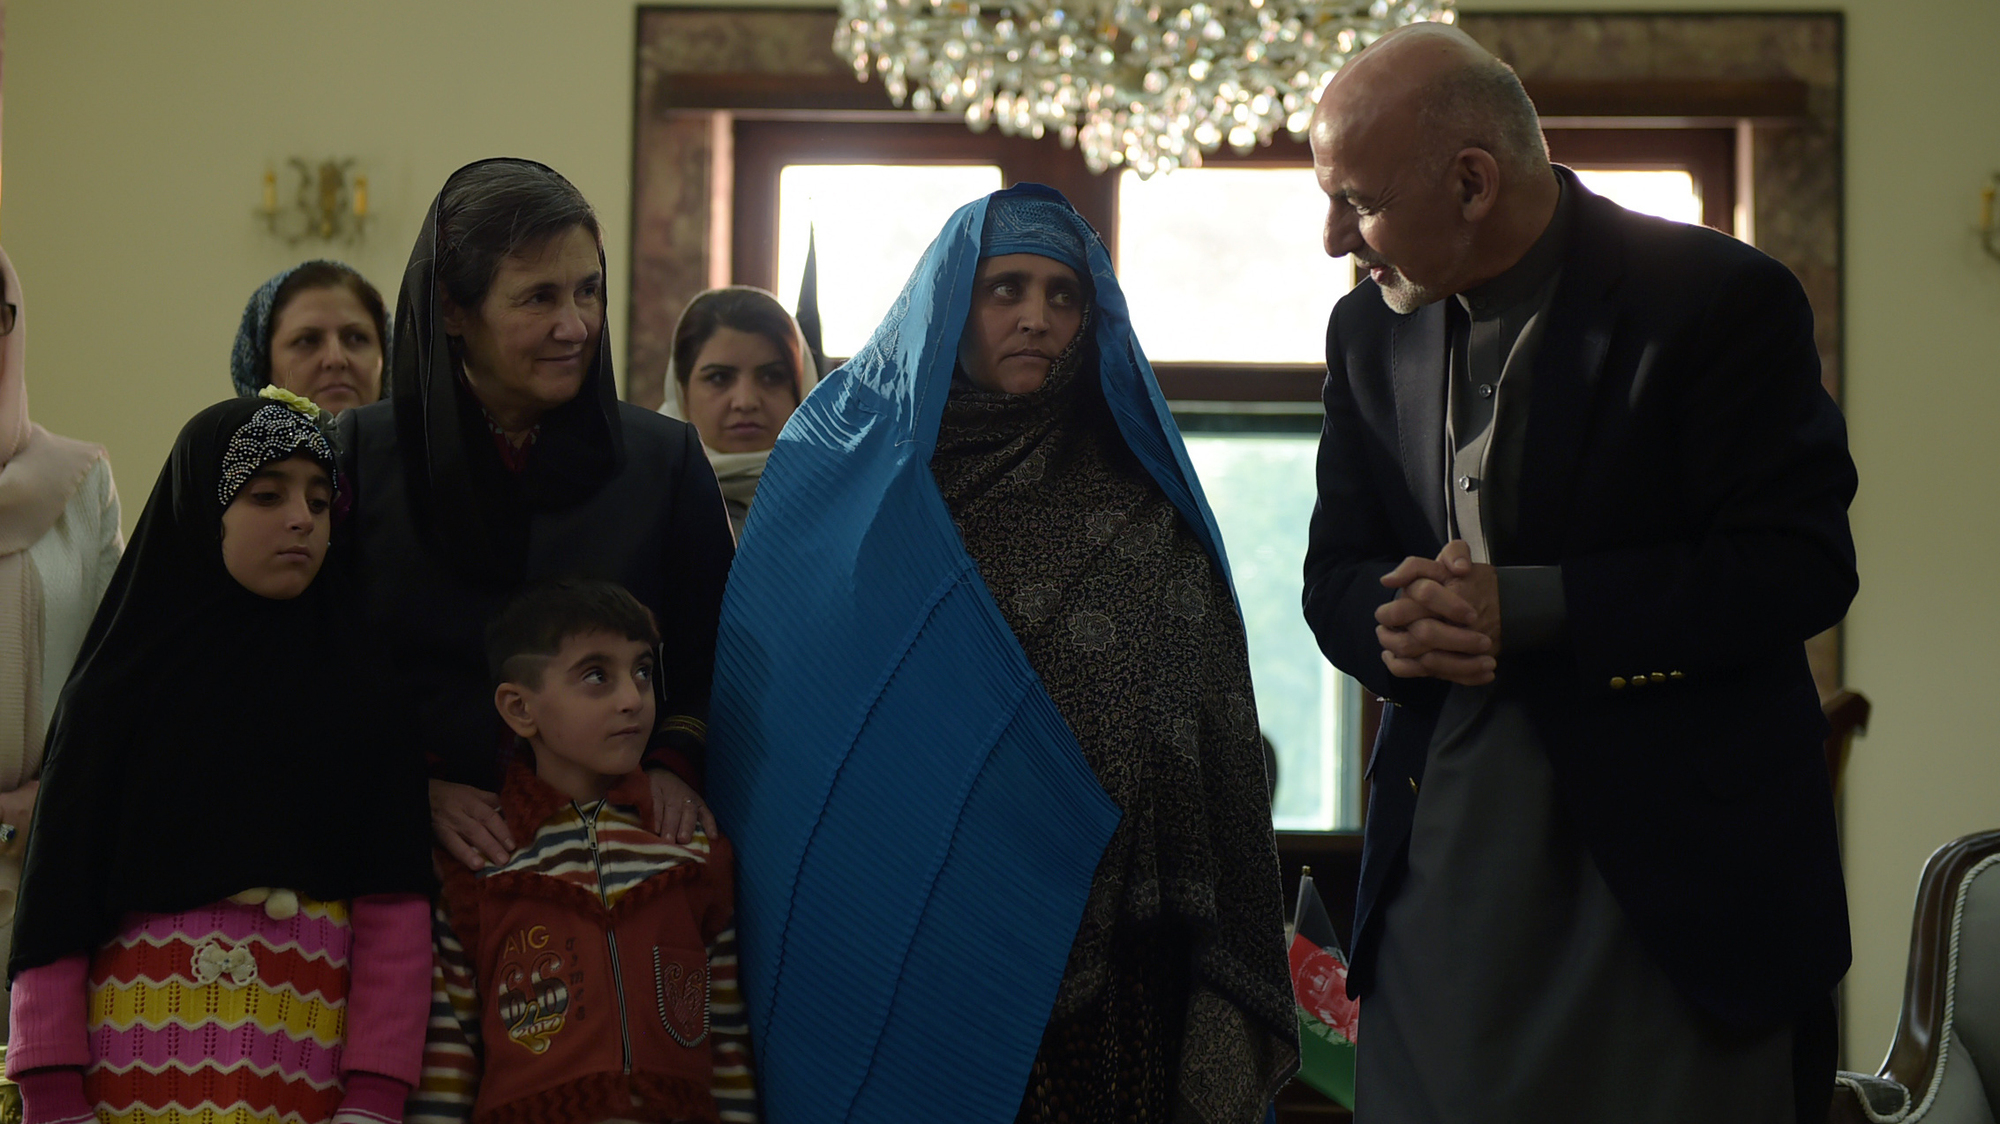 National Geographic green-eyed Afghan girl Sharbat Gula